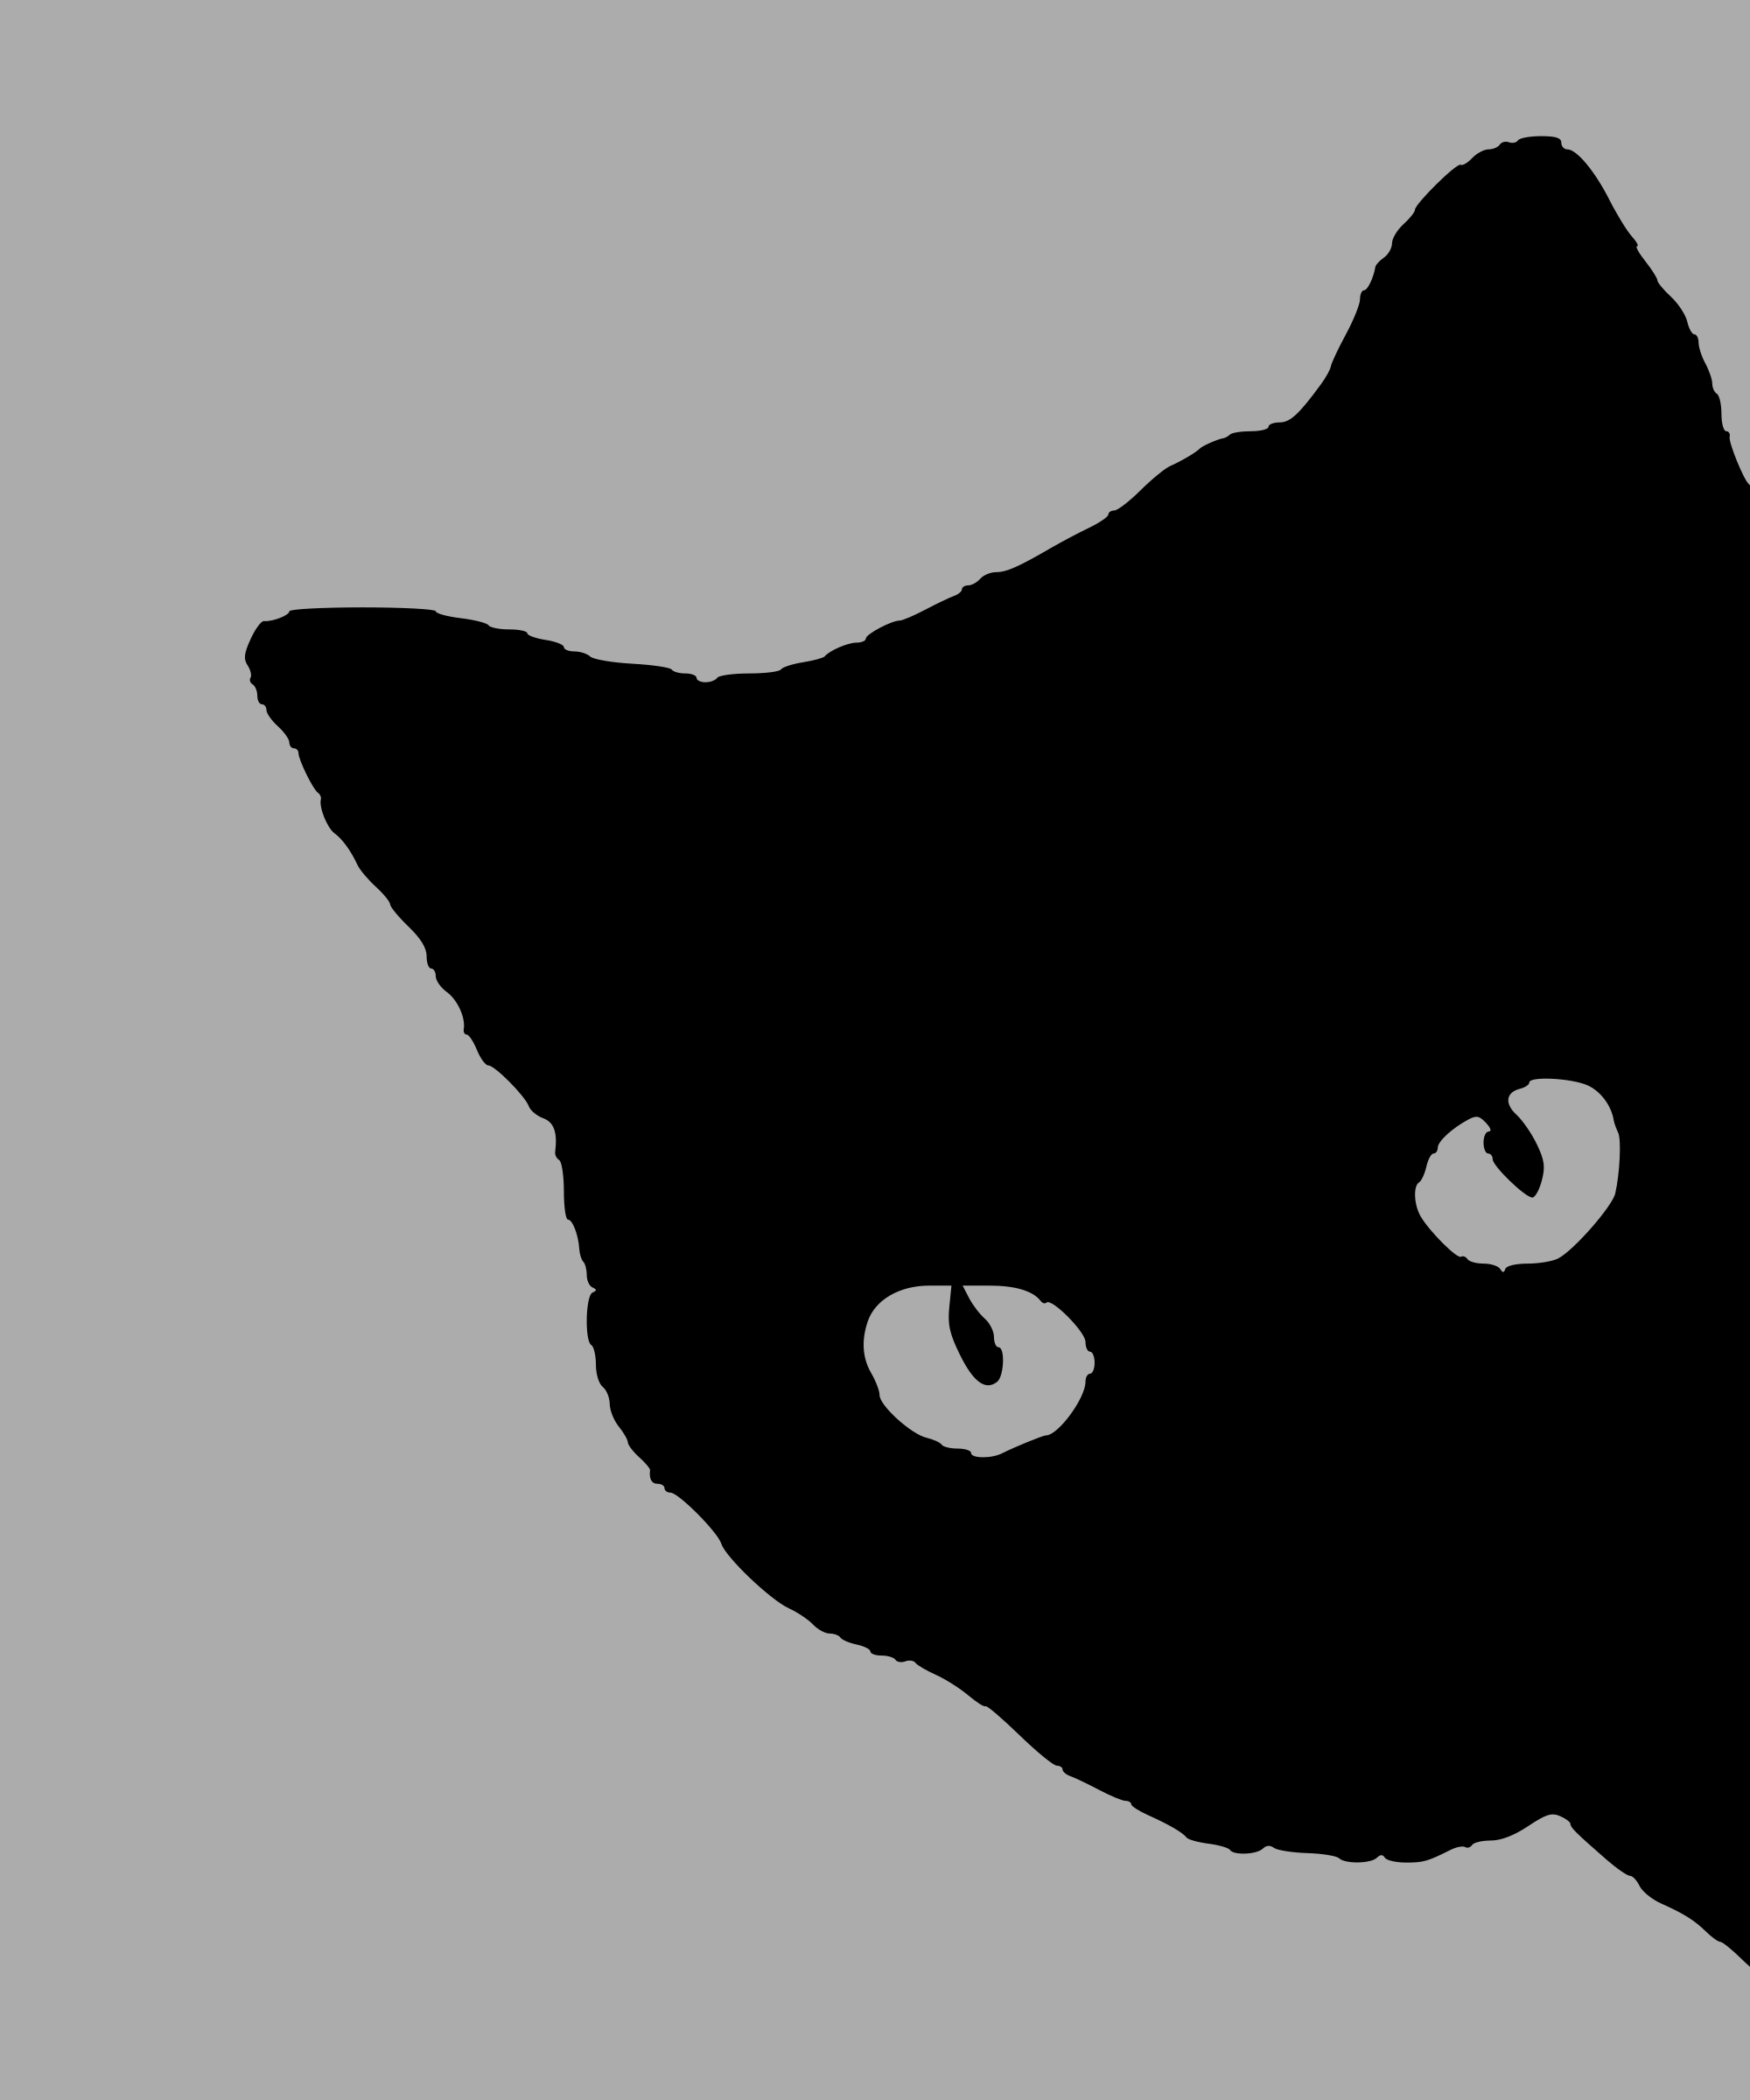 Cat Silhouette 01 Black Cat Silhouette Animal Silhouette Cat Silhouette